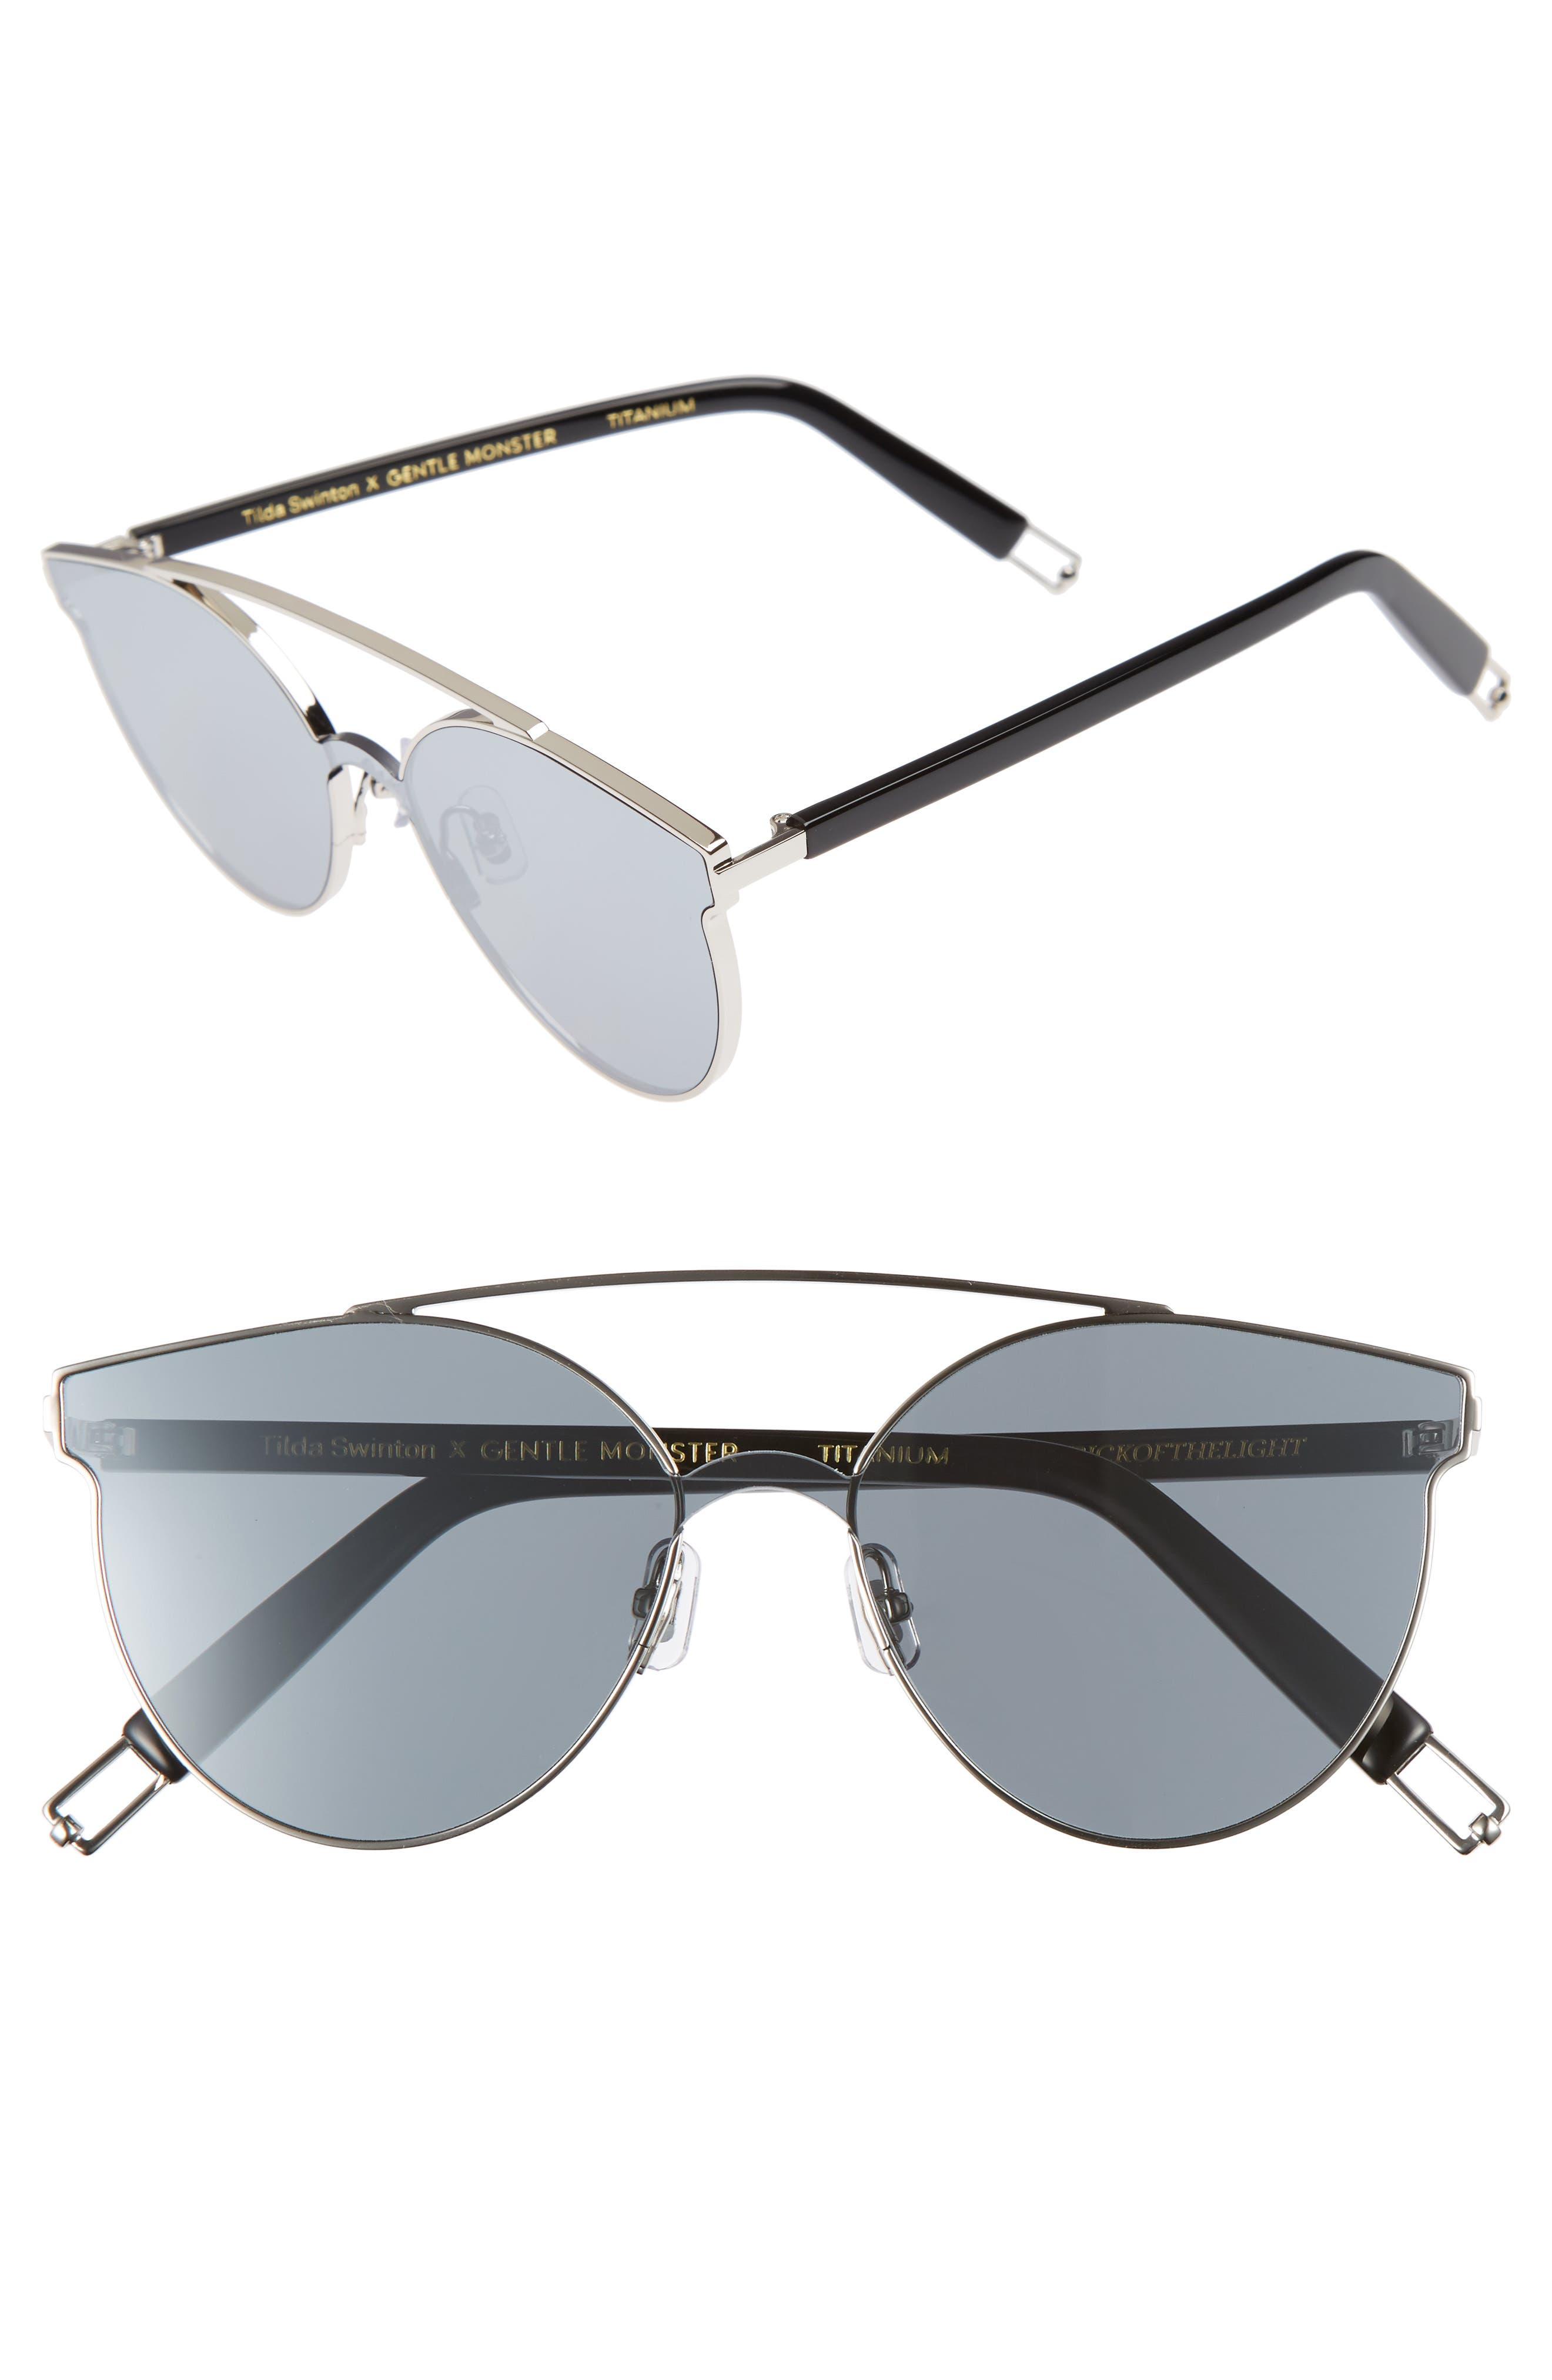 Tilda Swinton x Gentle Monster Trick of the Light 60mm Shield Sunglasses,                             Main thumbnail 1, color,                             040